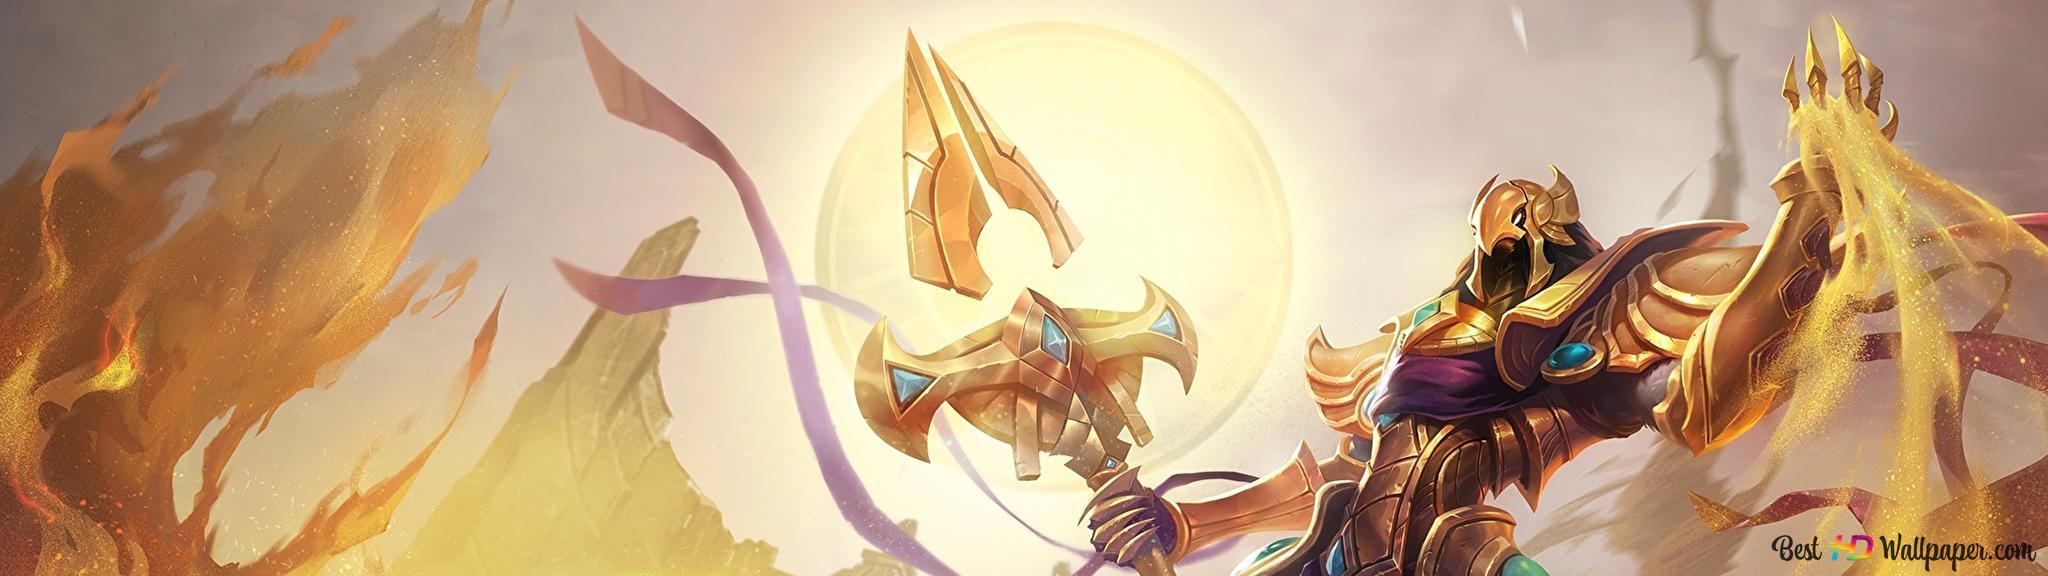 League Of Legends Azir Emperor Of The Sands Hd Wallpaper Download